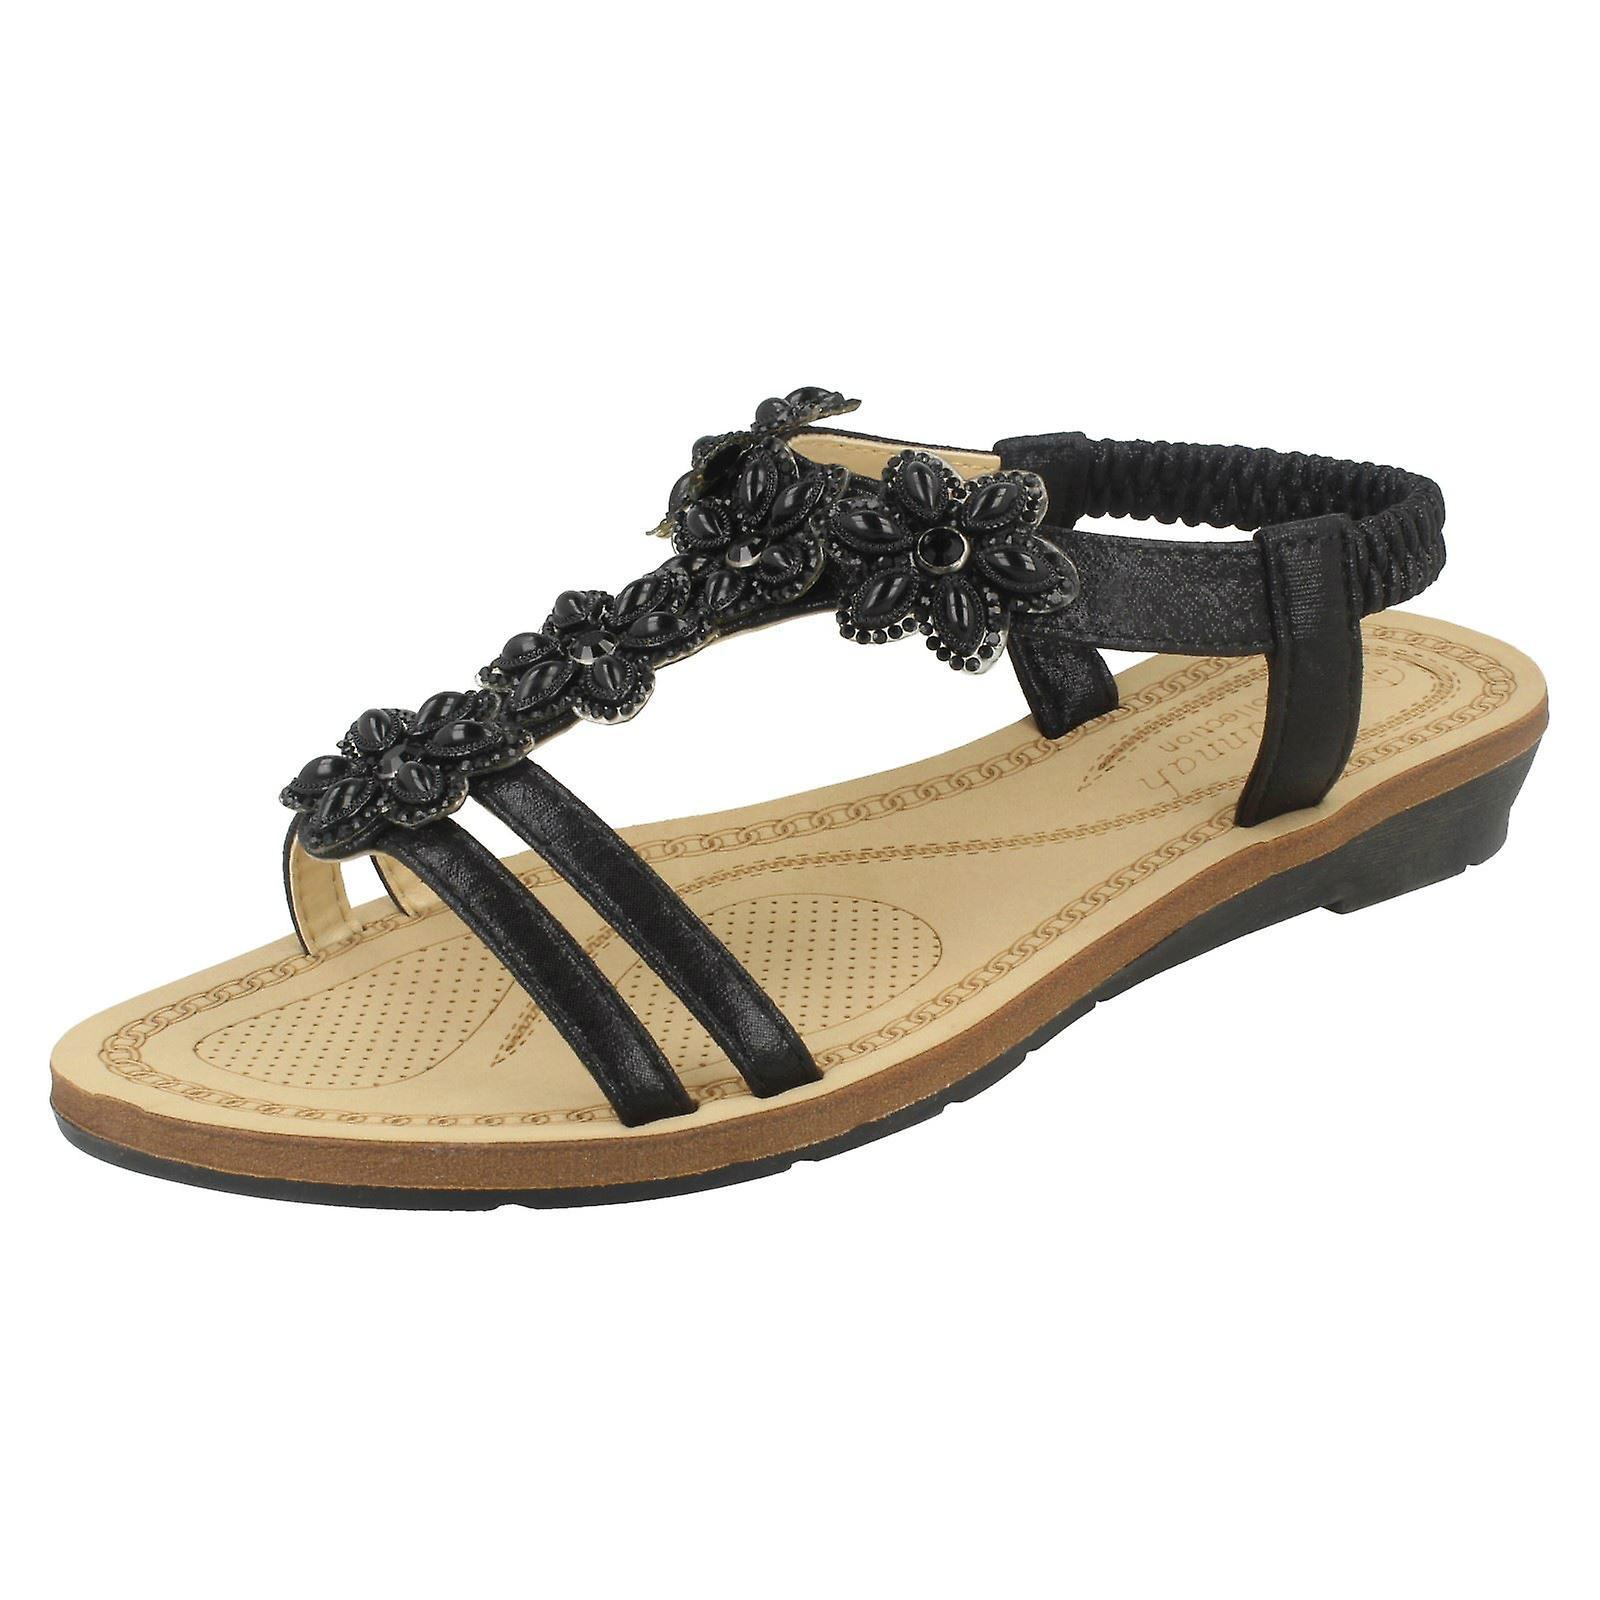 Ladies Savannah Strappy Slingback Sandals F10871 7RMvZ